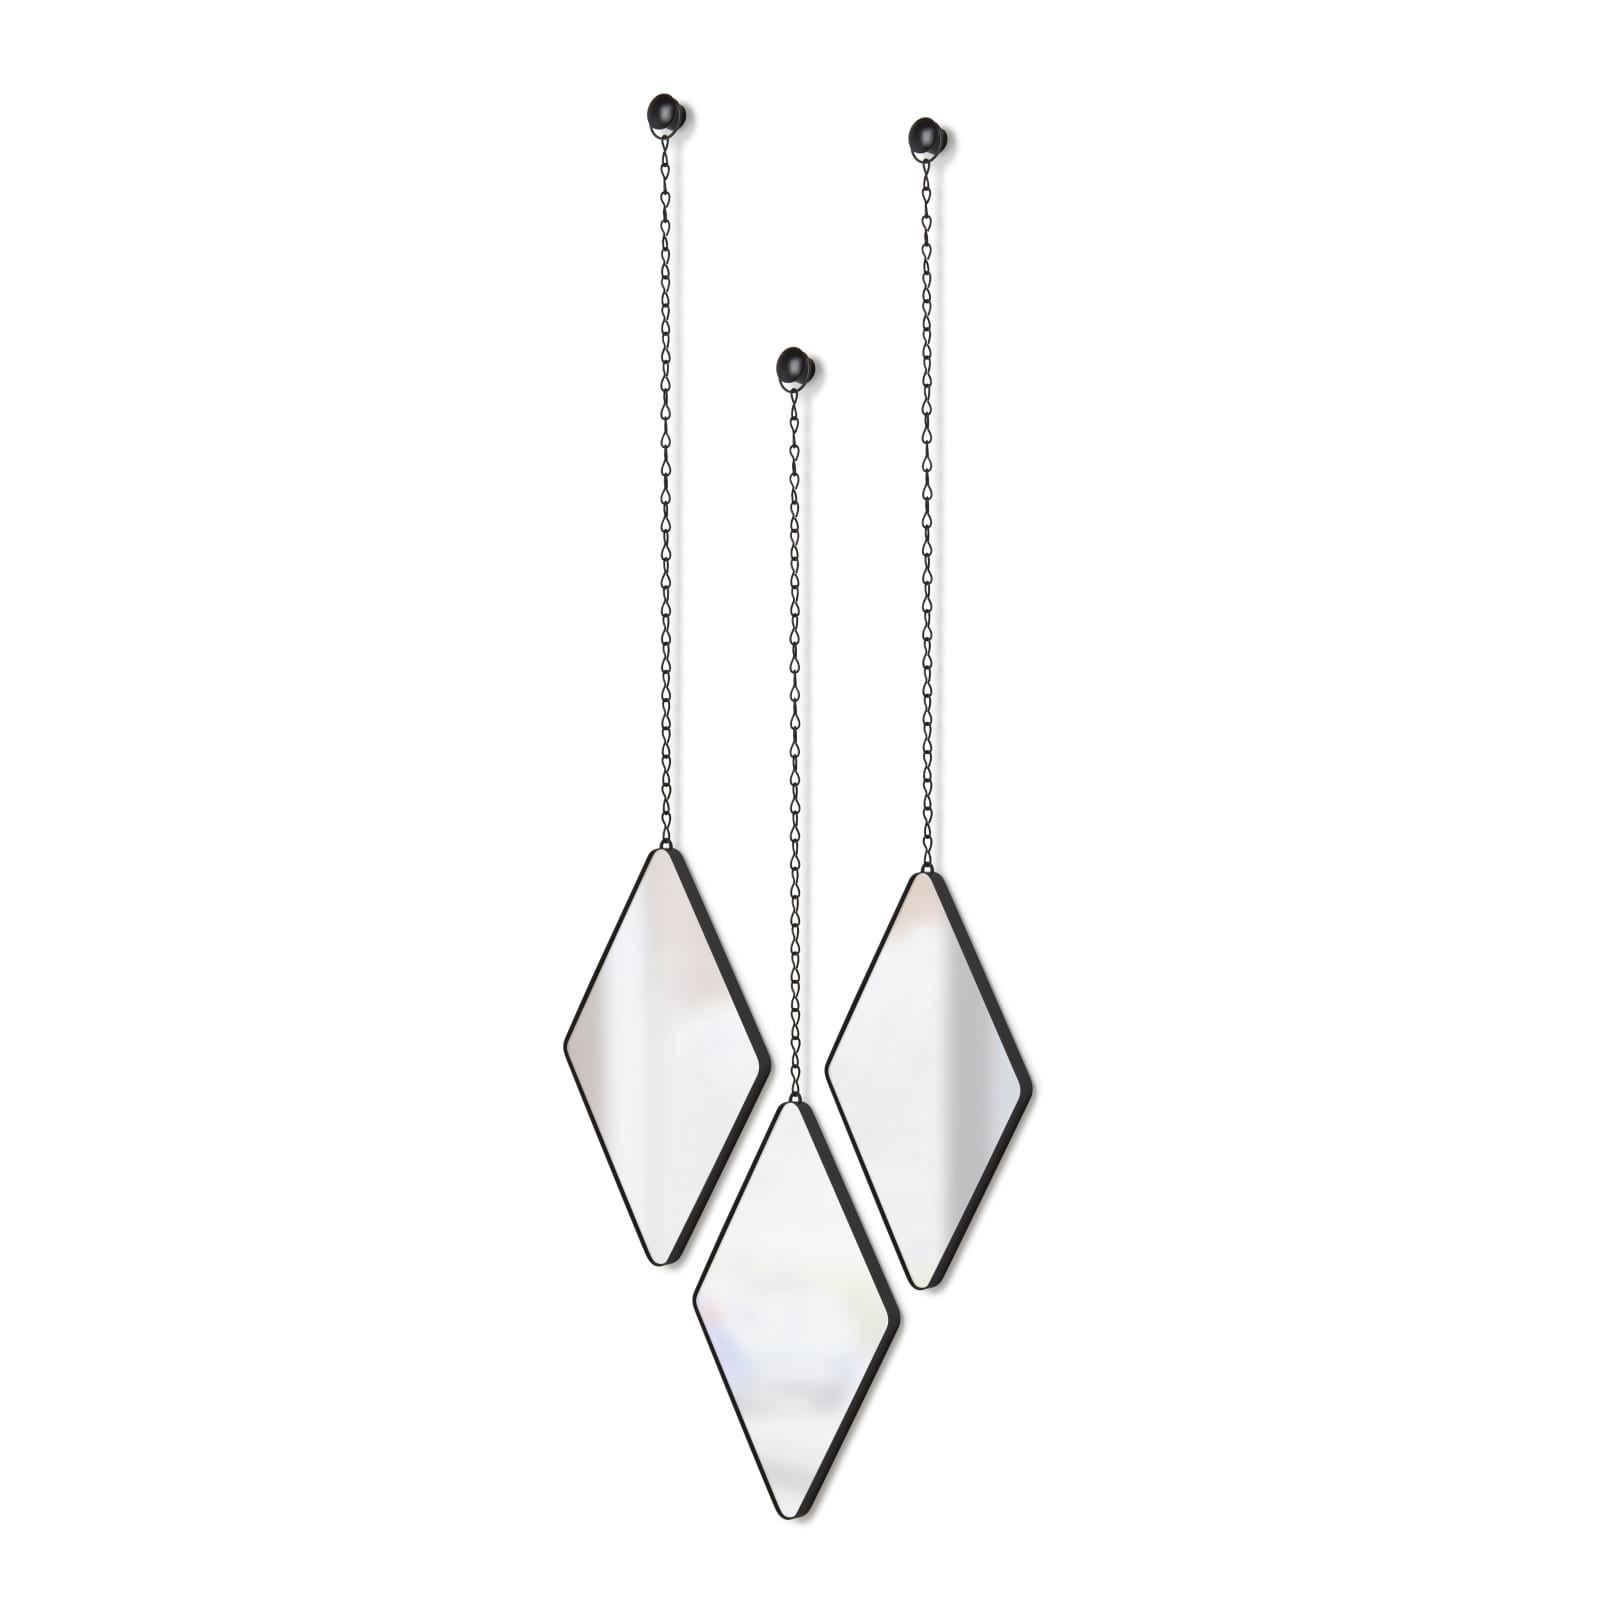 Dima Mirrors Set of 3 (Black) - Umbra